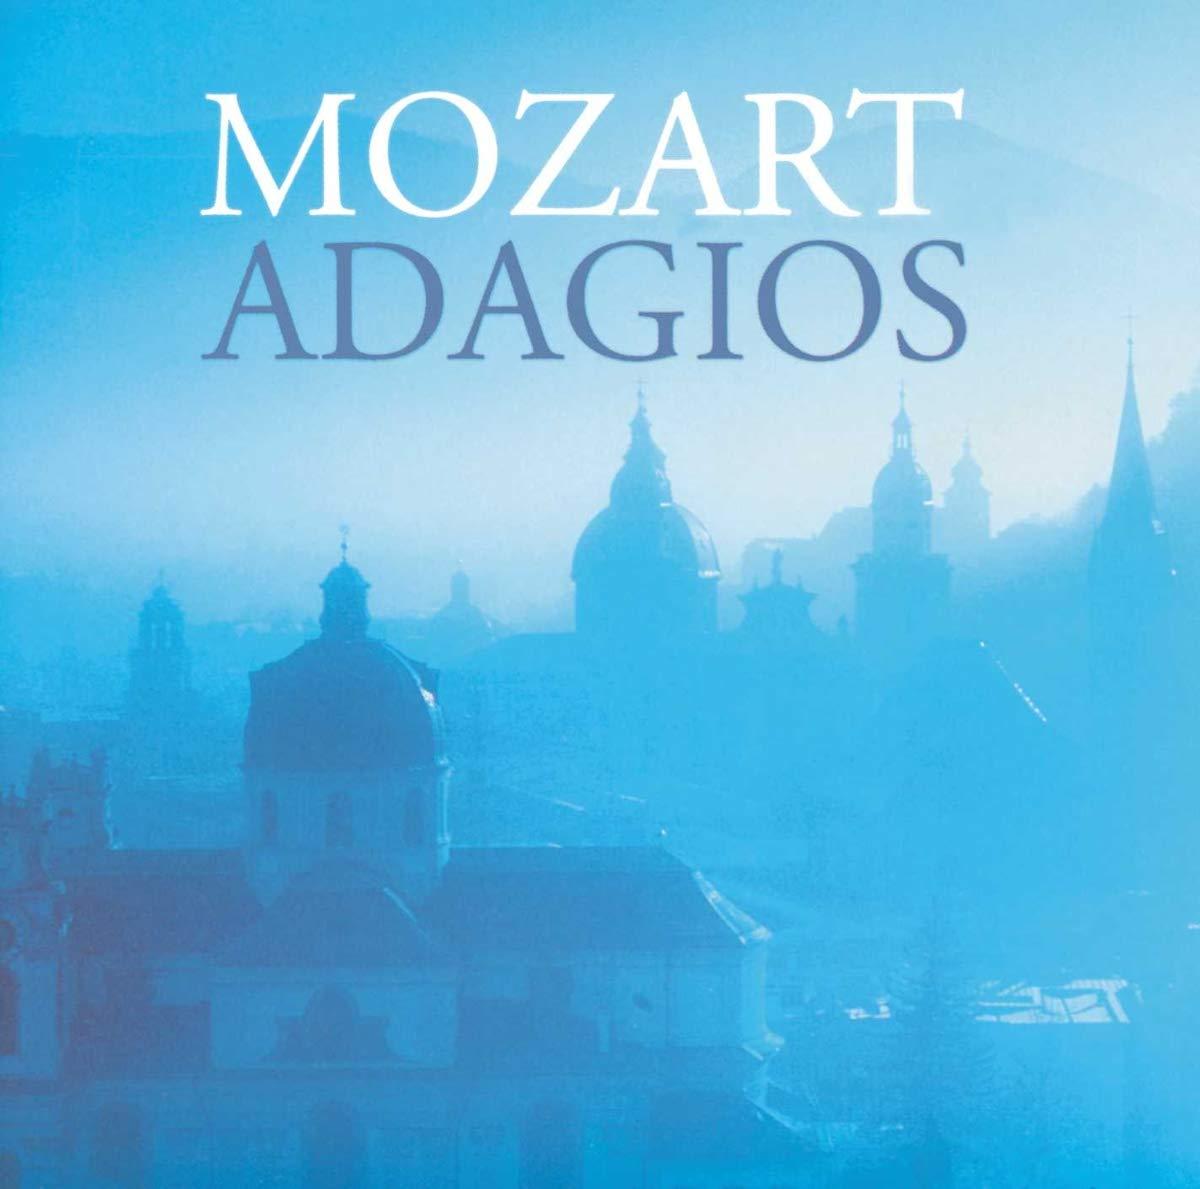 Mozart Adagios 4 years Memphis Mall warranty